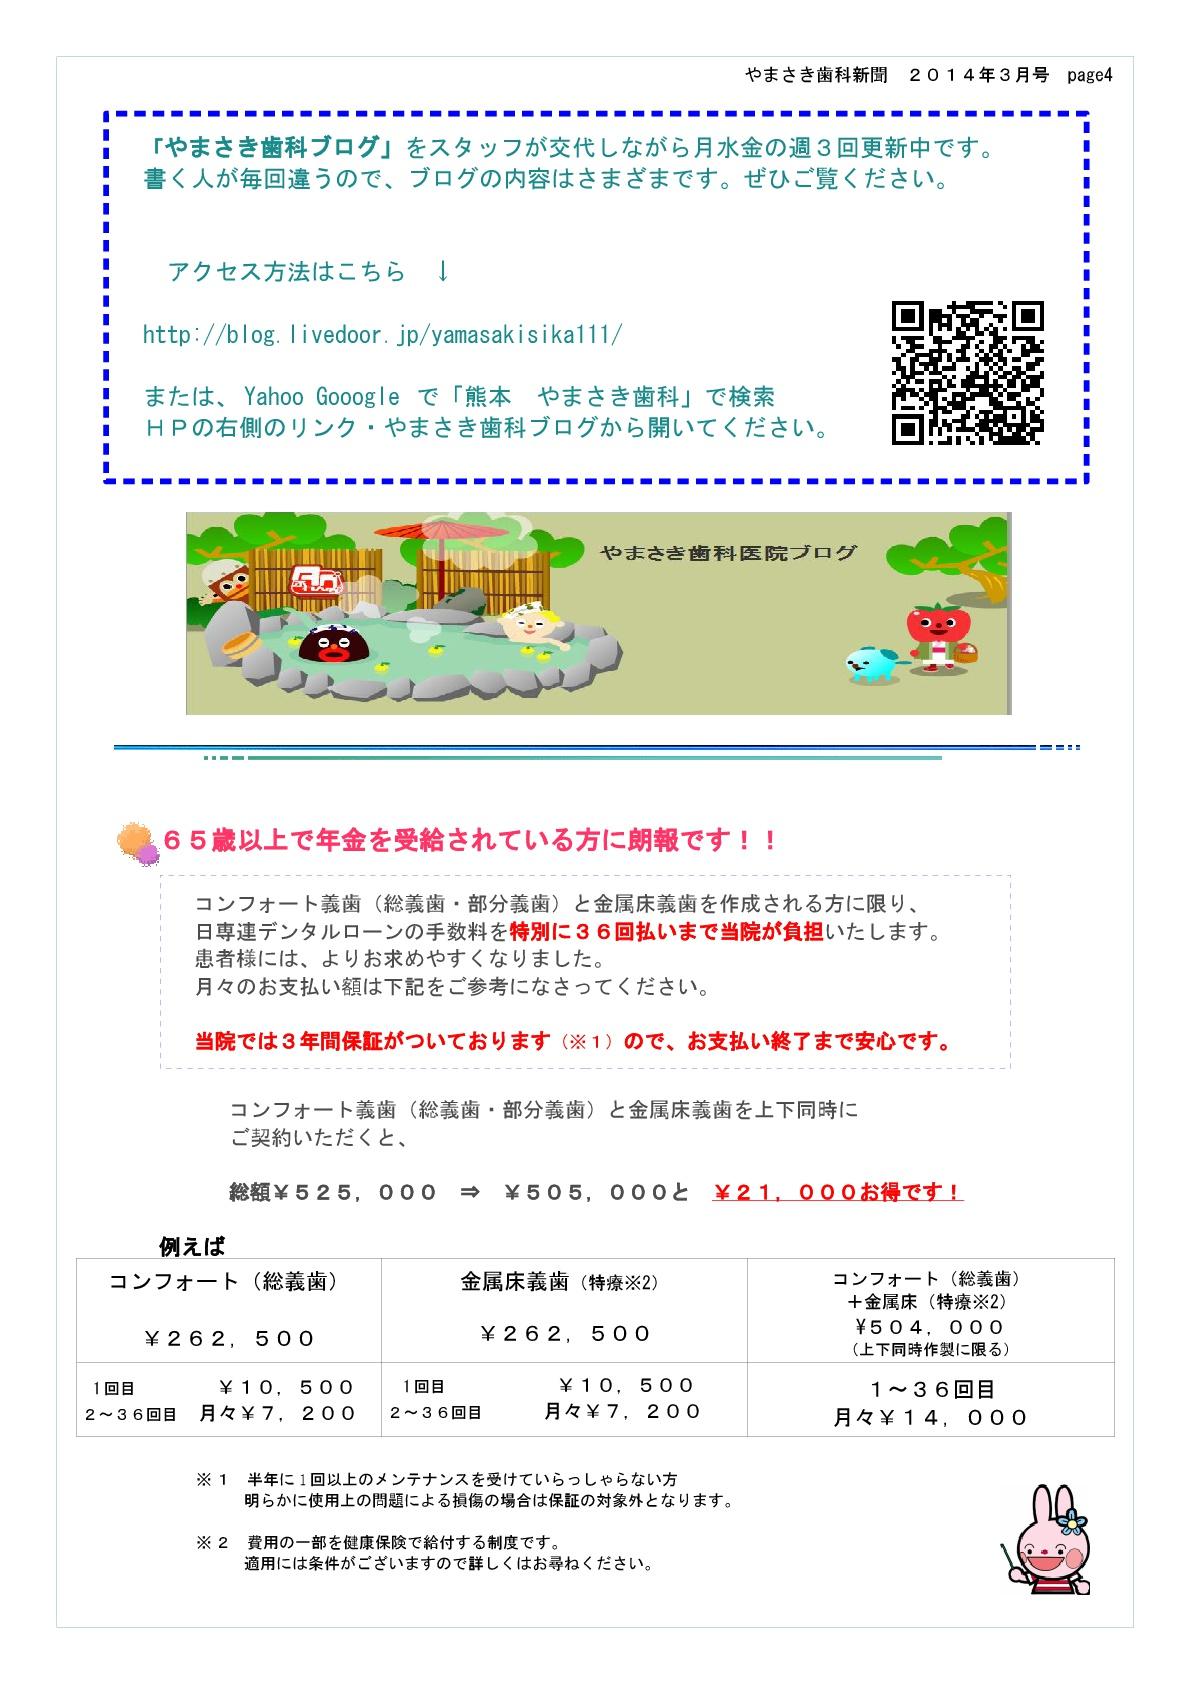 sinbun14-3-2-003